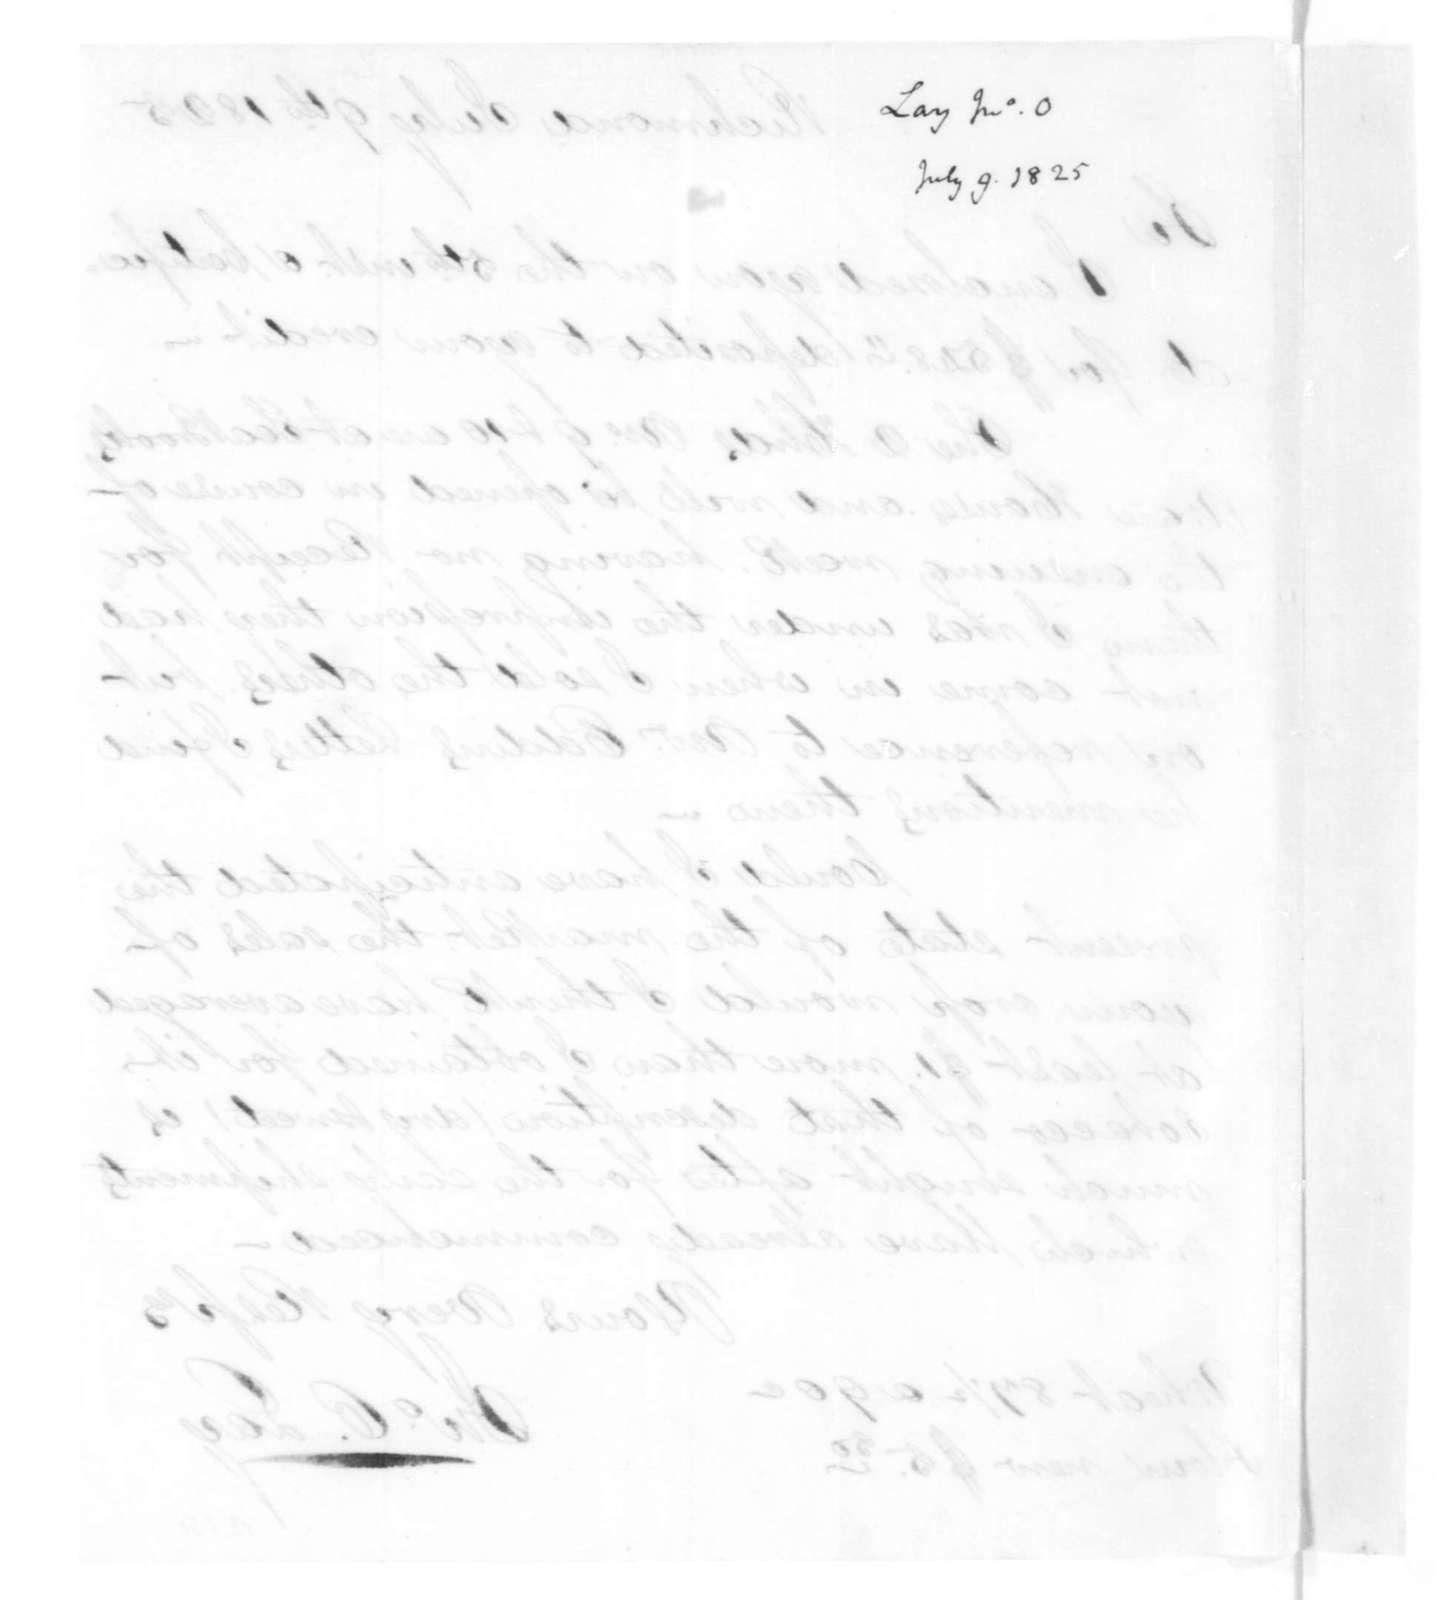 John O. Lay to James Madison, July 9, 1825.